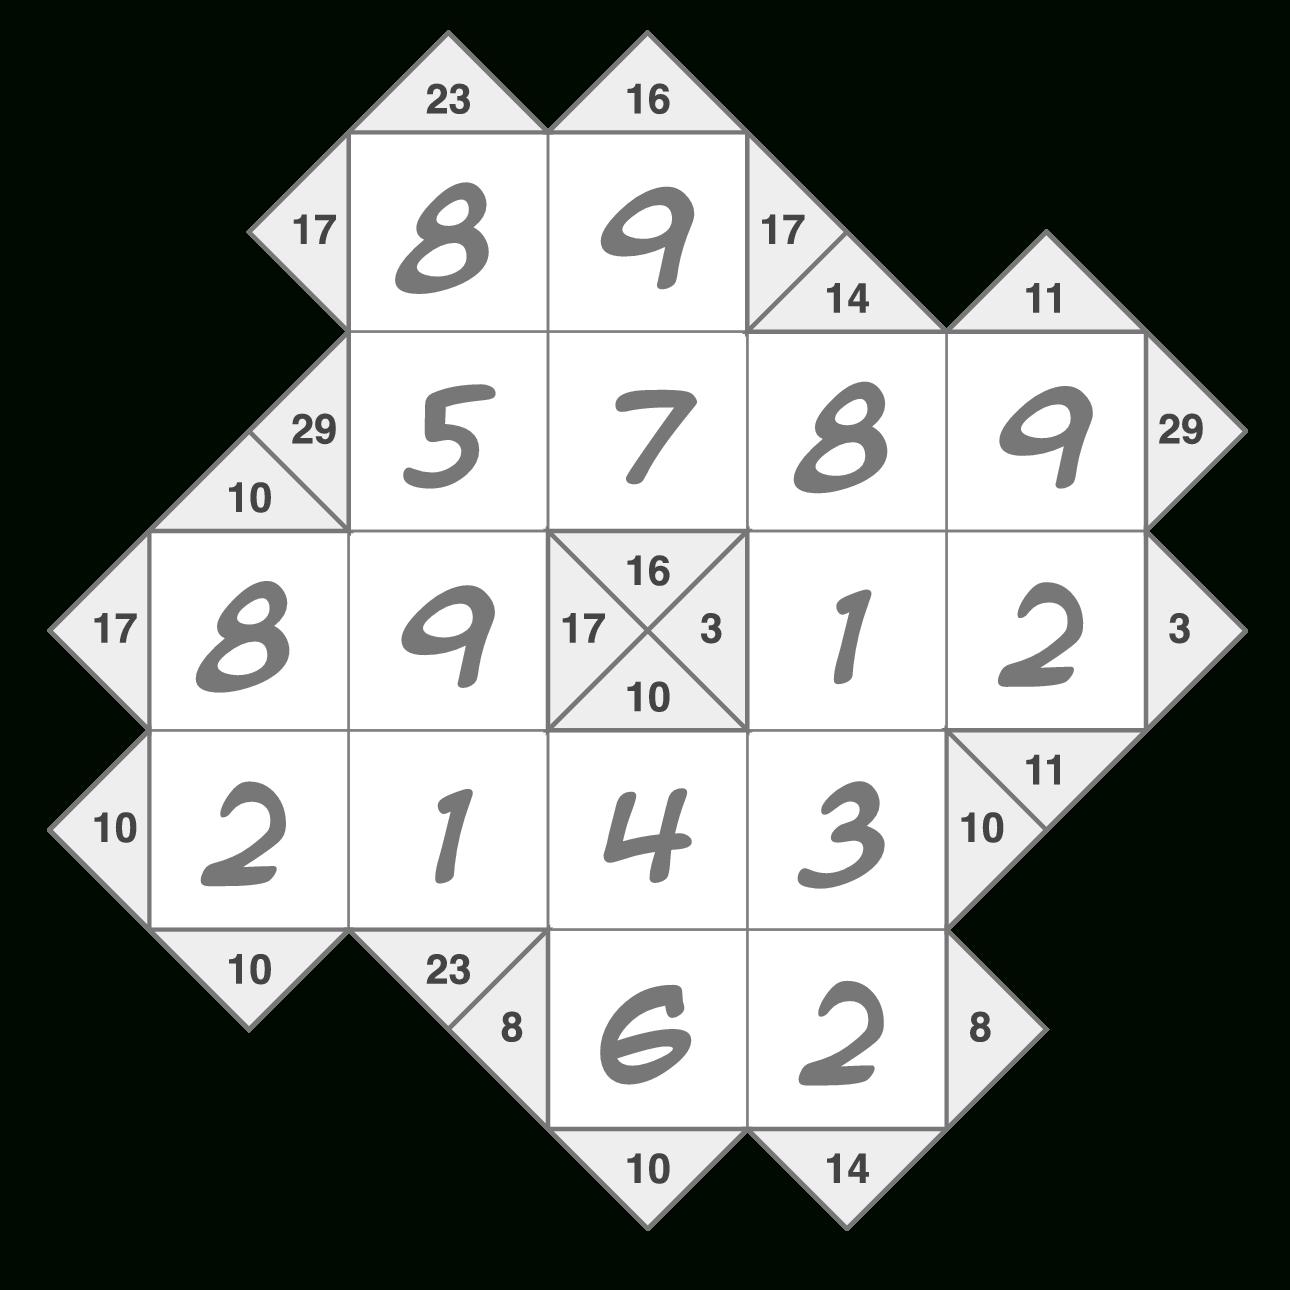 Krypto Kakuro Puzzleskrazydad - Printable Puzzles By Krazydad